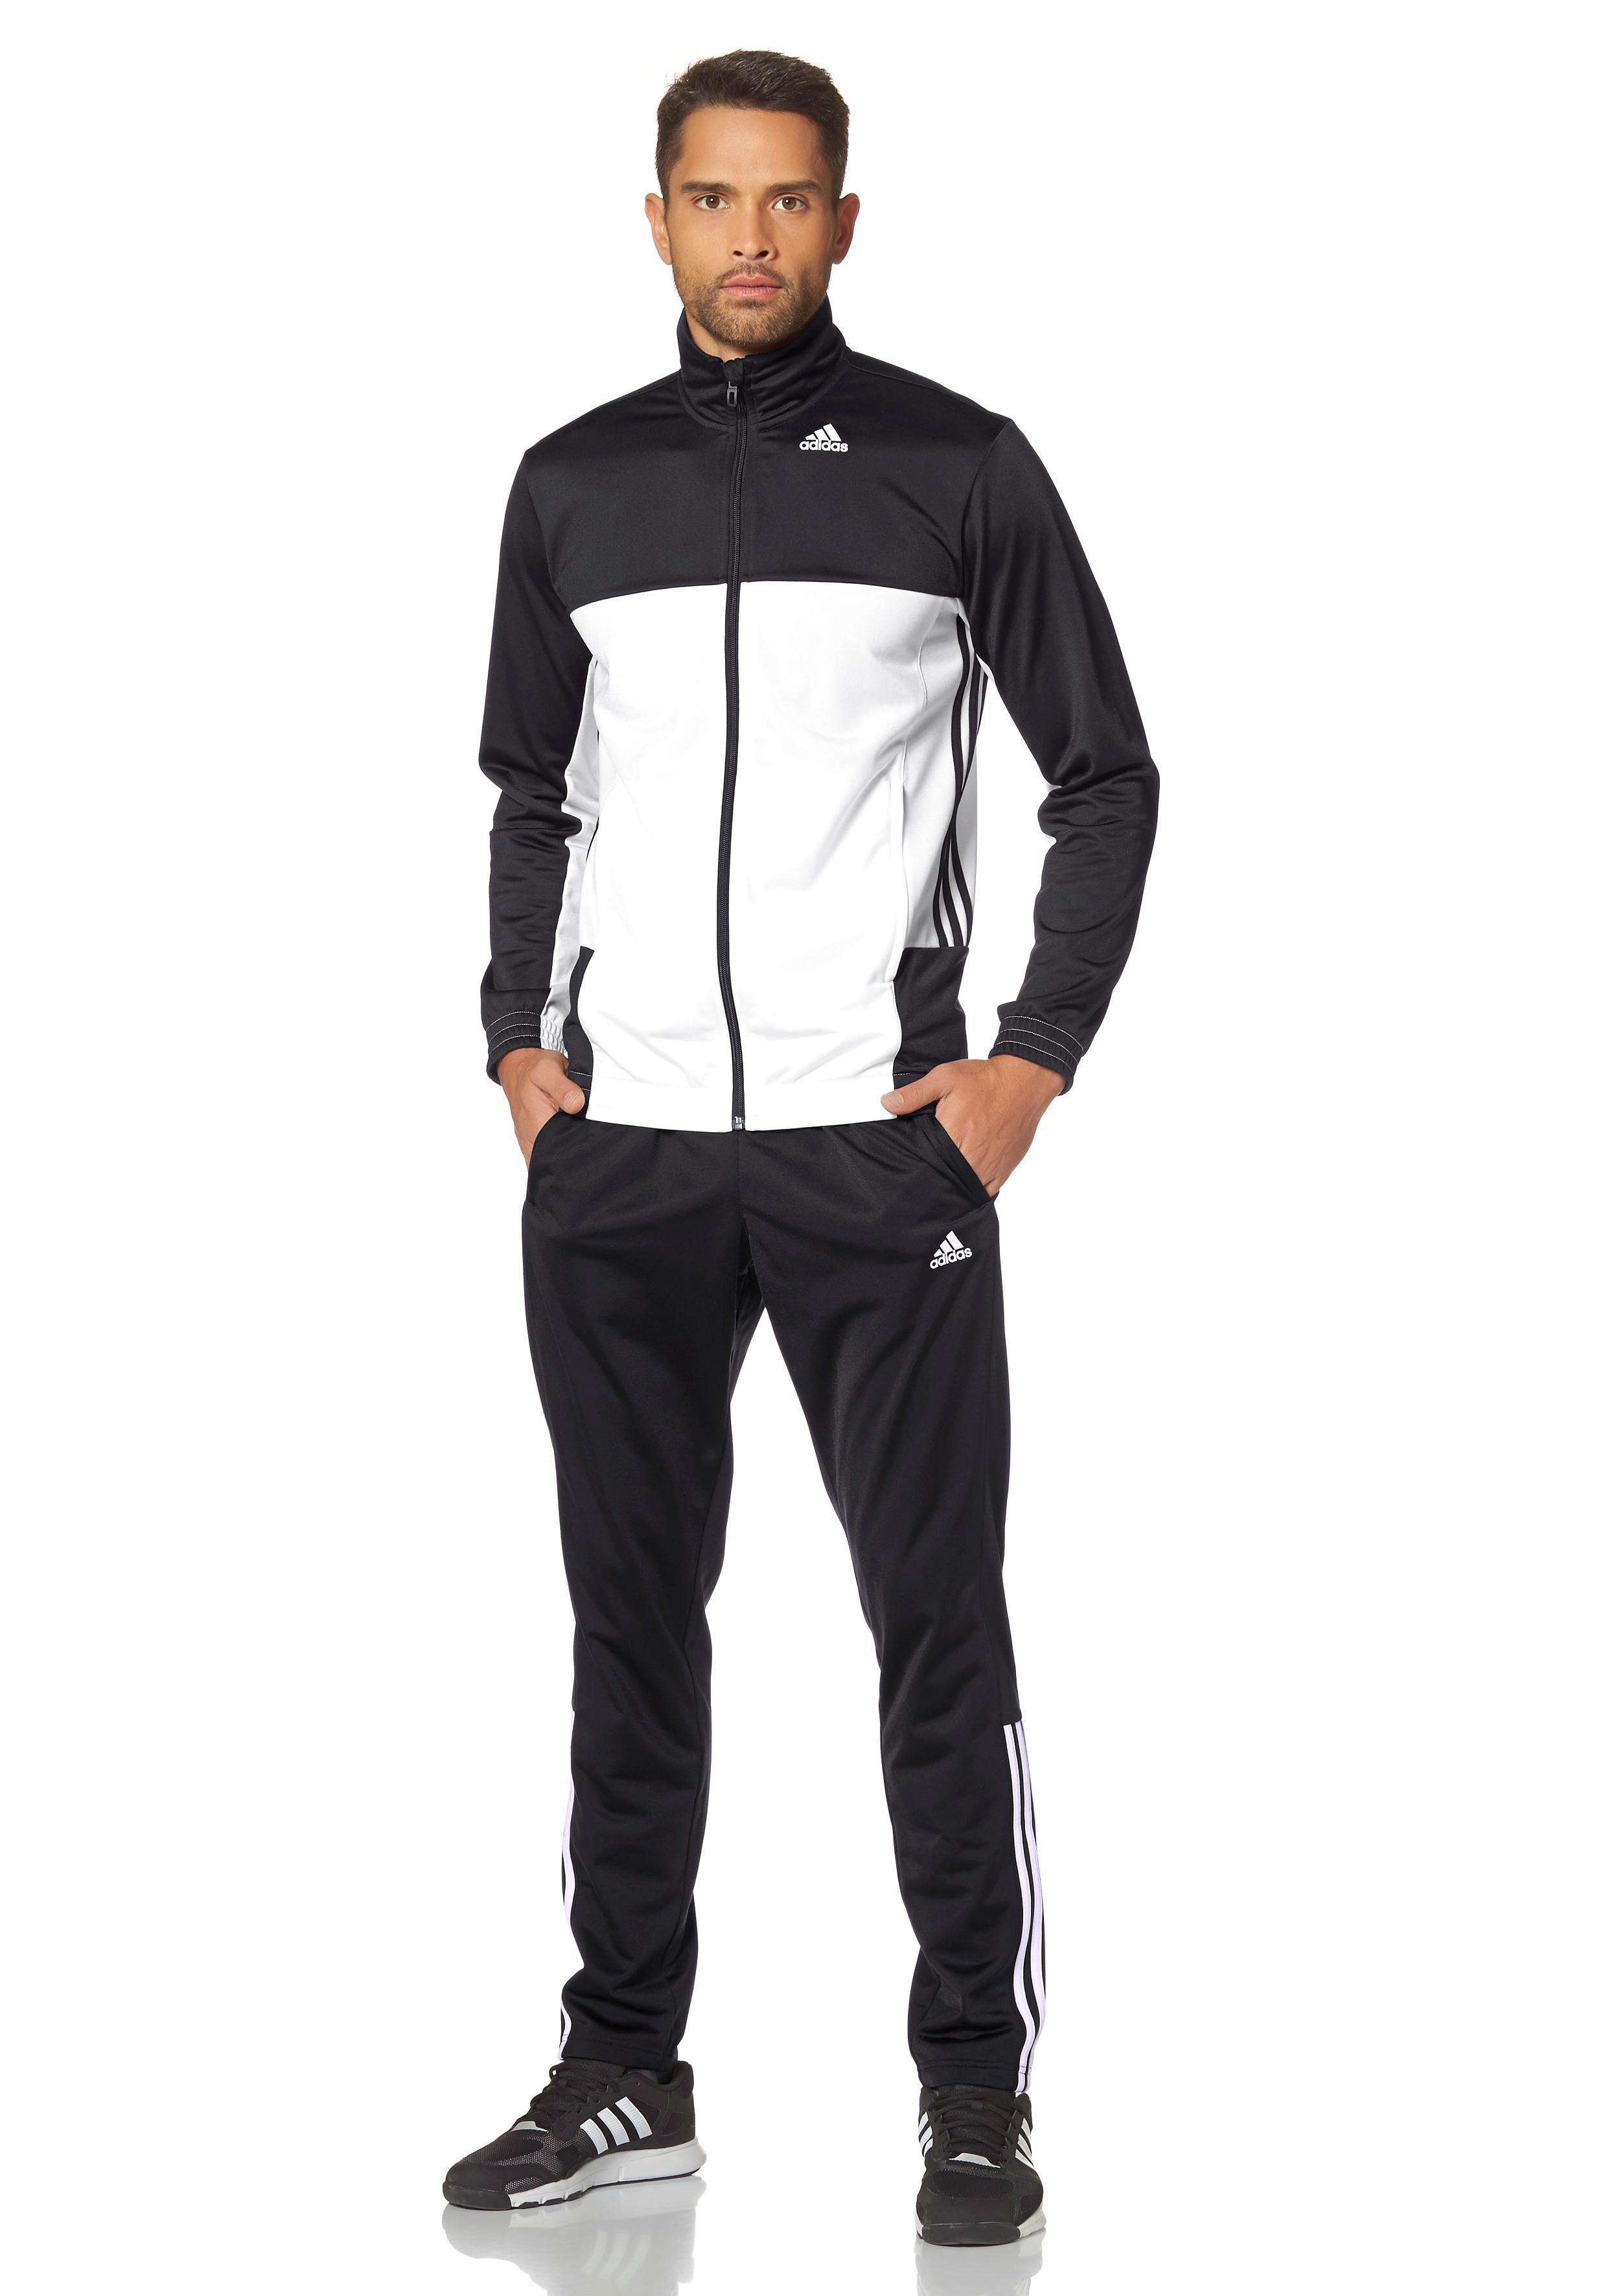 Adidas Performance Trainingspak duitsland-op-vakantie.nl